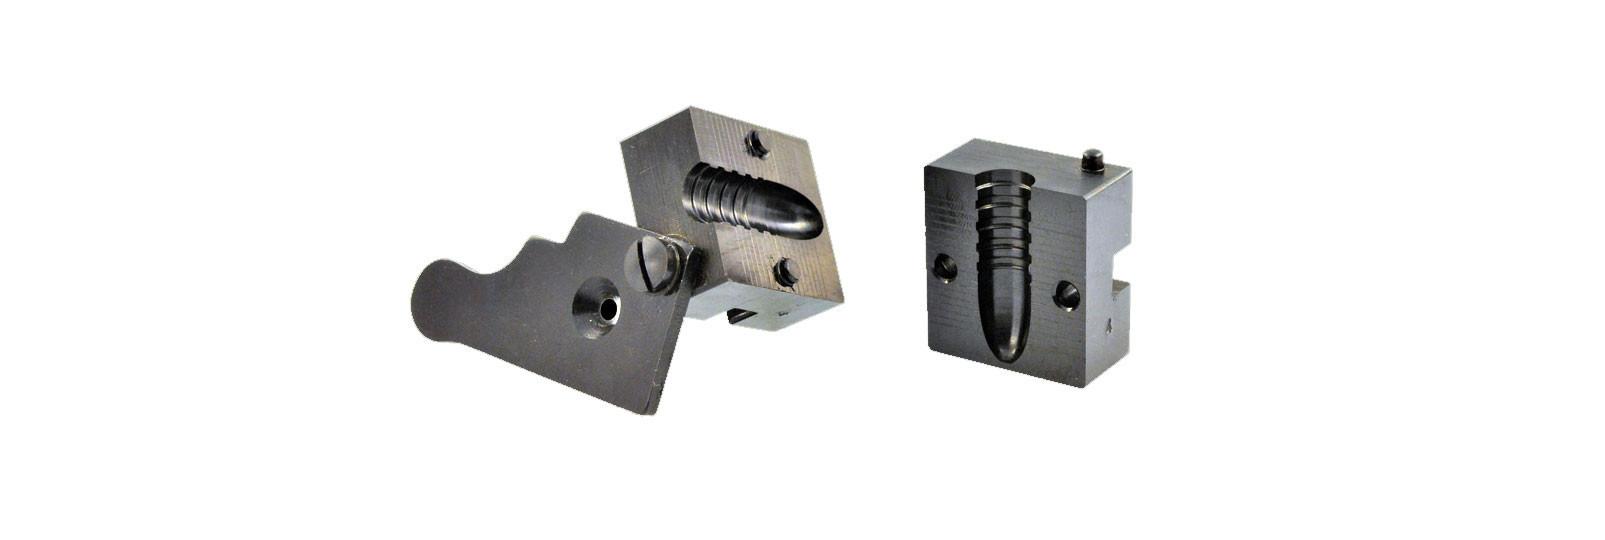 Steel block .458 conical